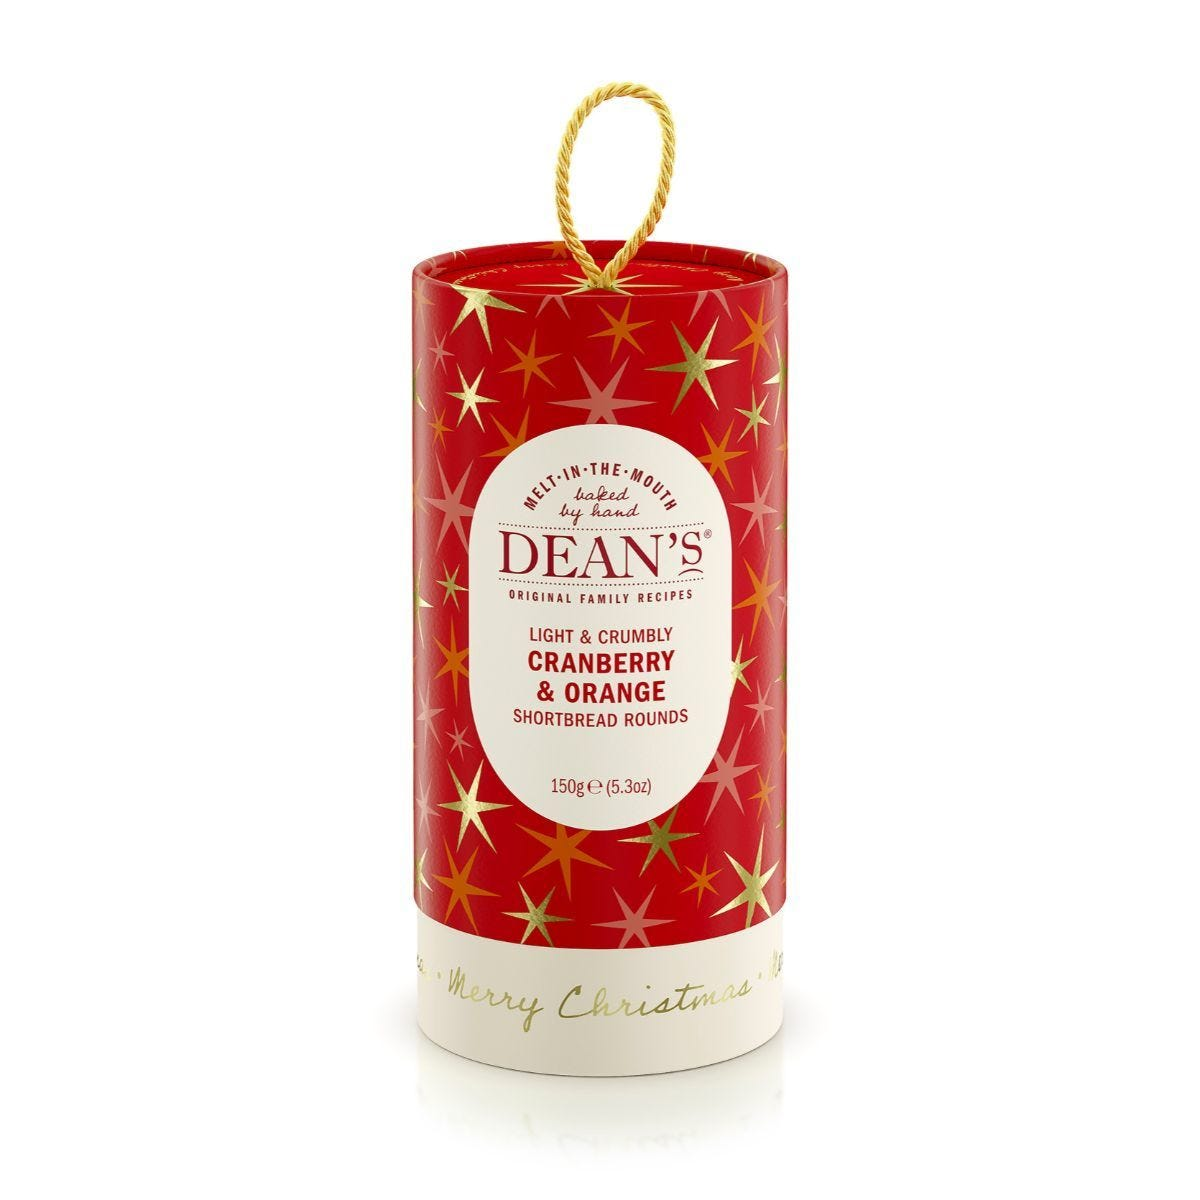 Deans Shortbread Cranberry and Orange Rounds - 150g